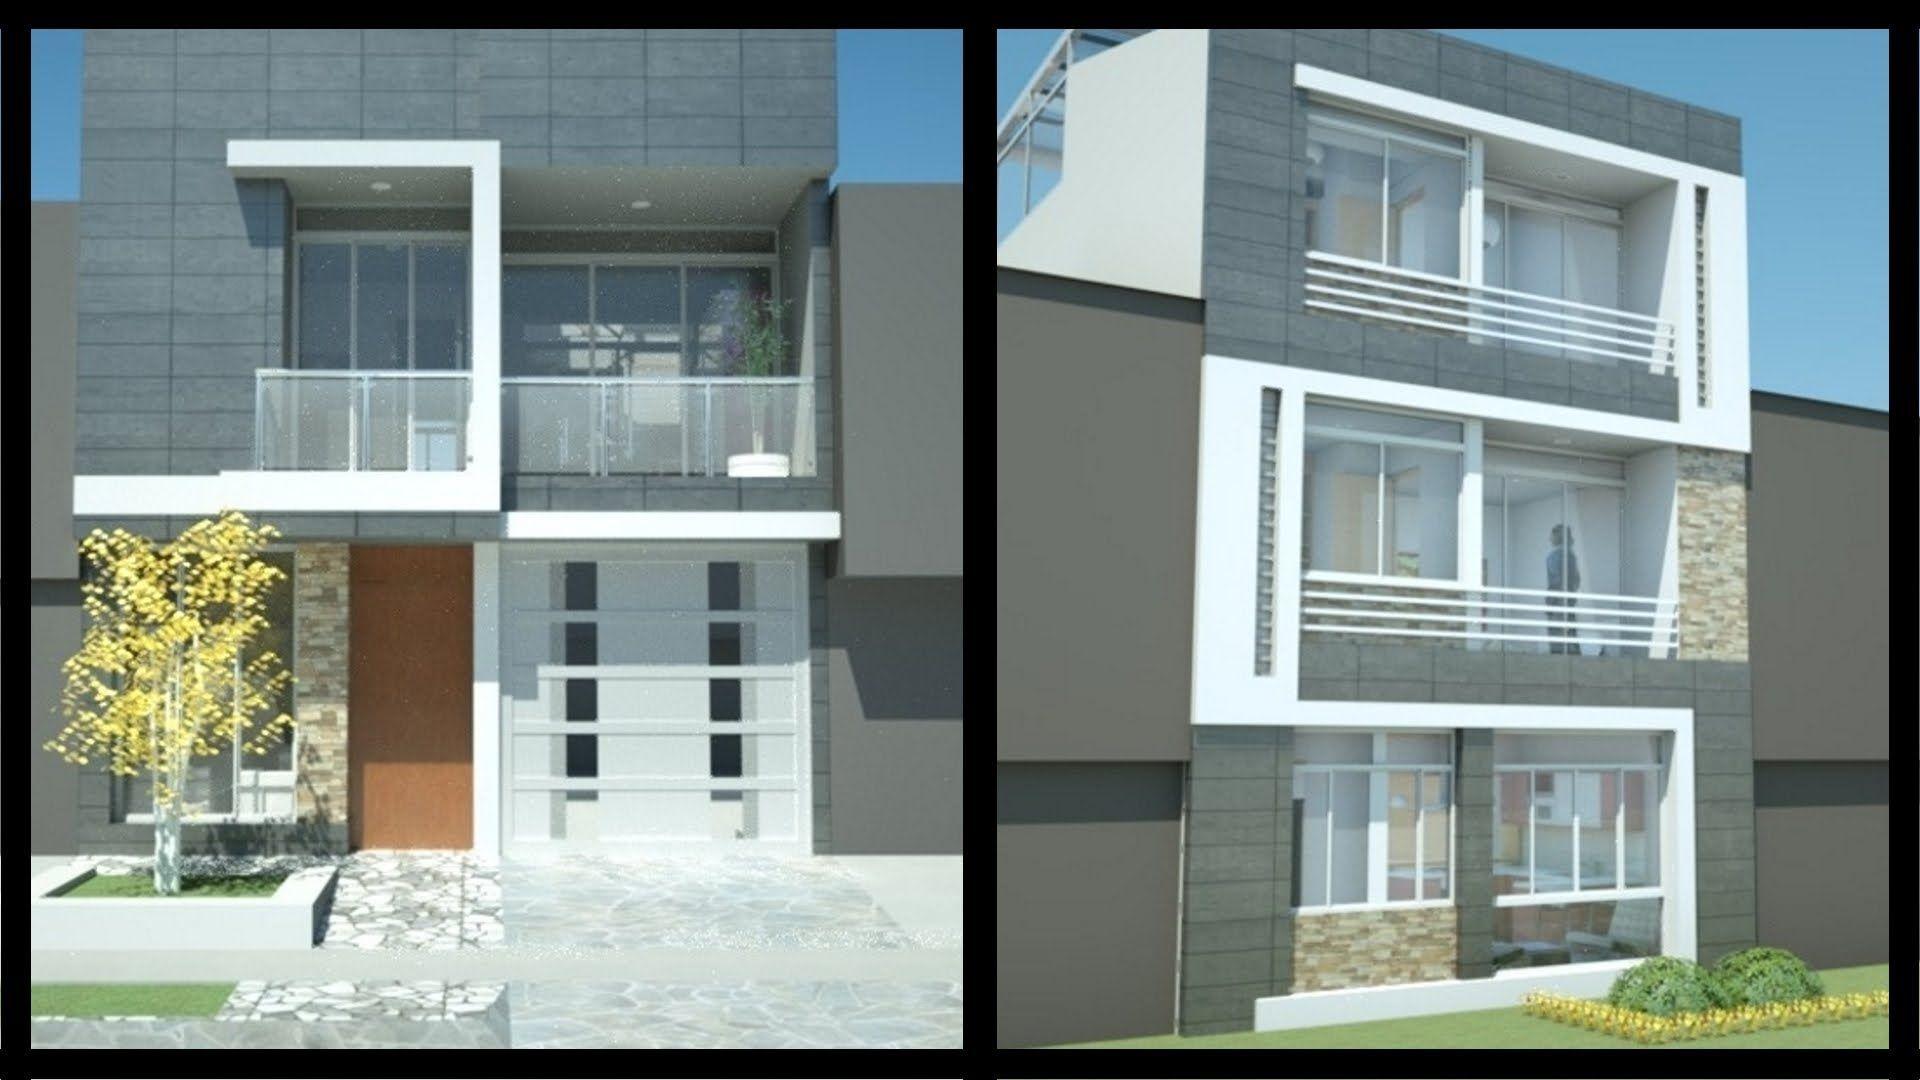 Casa moderna minimalista 6.00 m x 12.50 m, 220 m² Casa